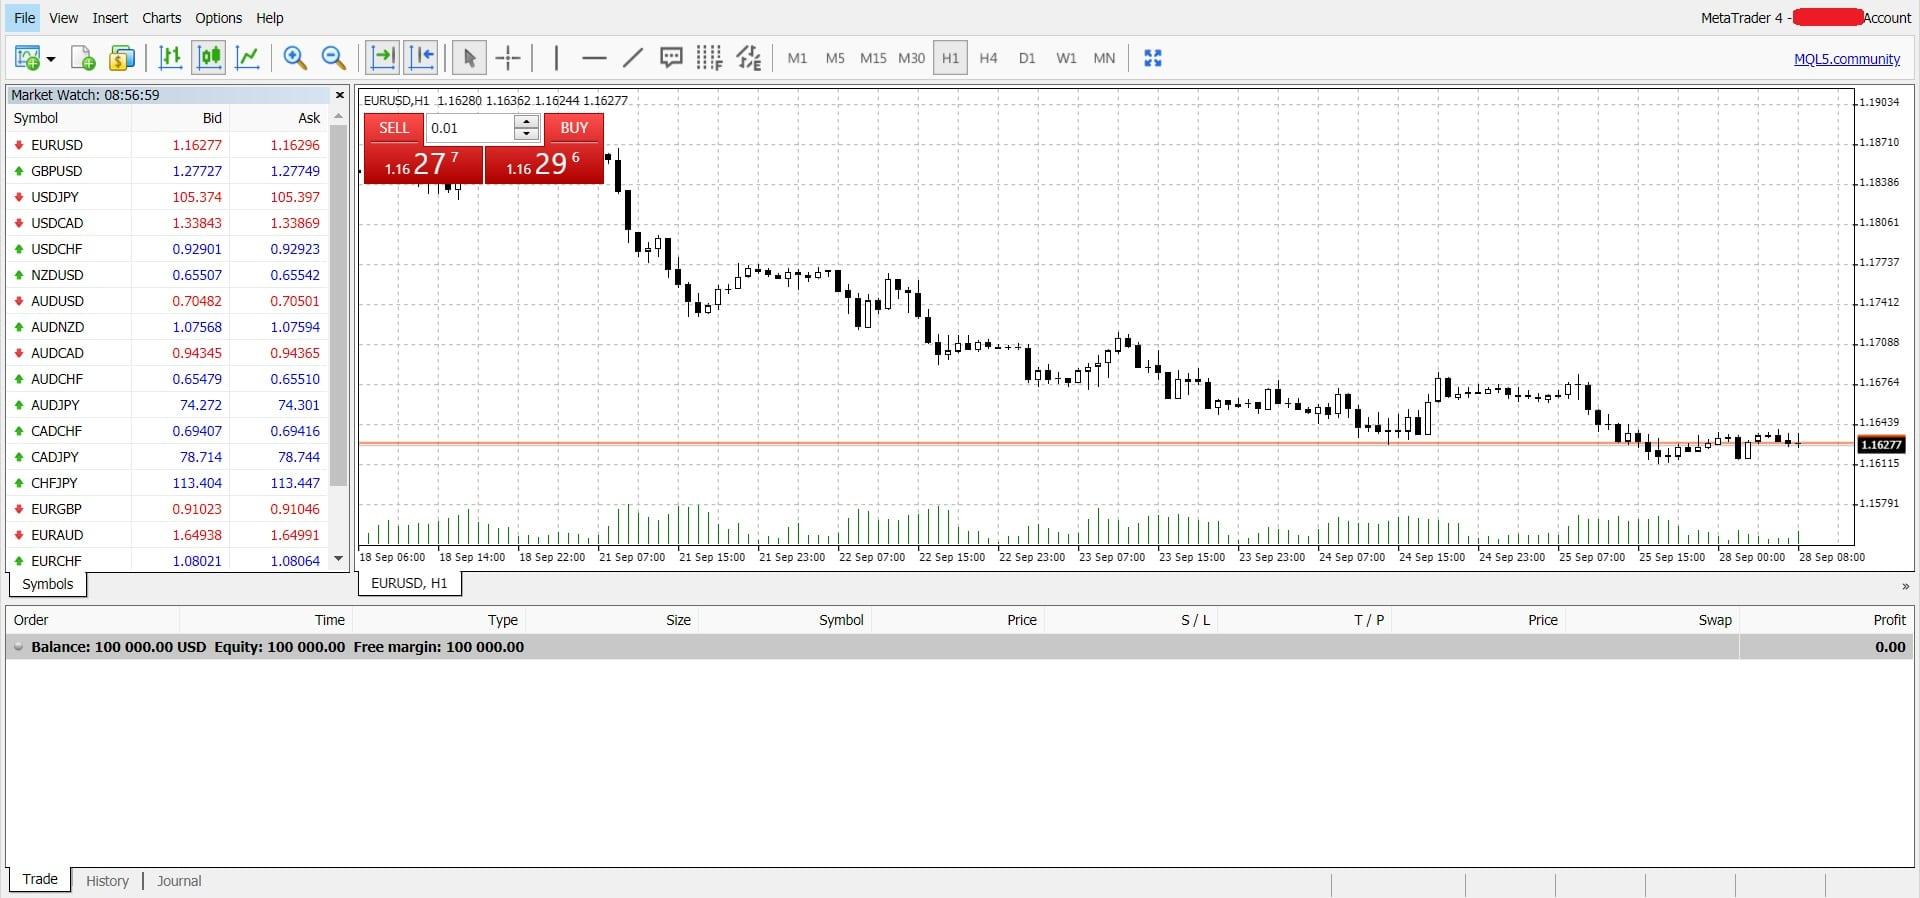 Markets.com MetaTrader 4 (MT4) platform